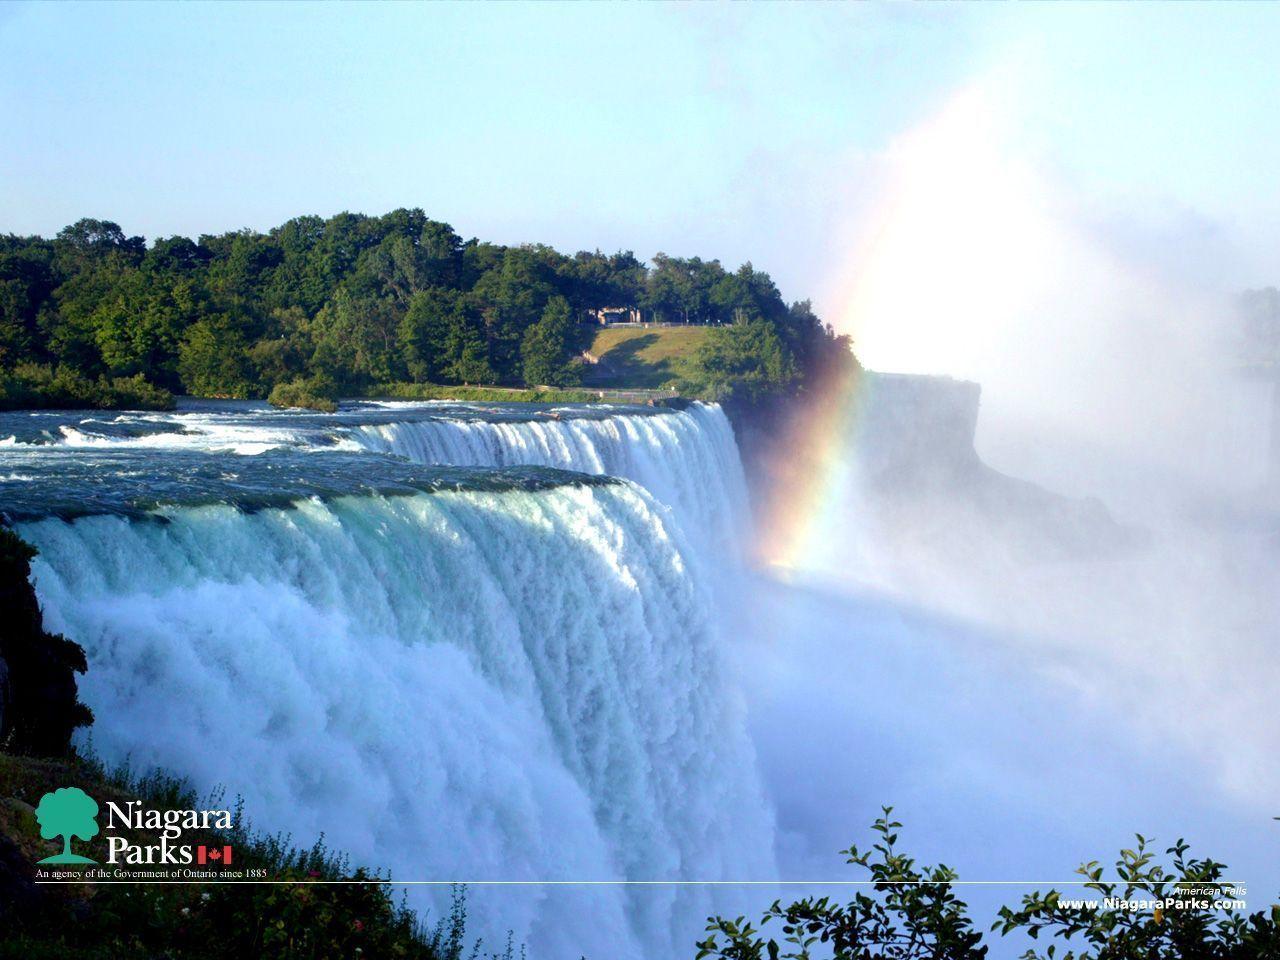 Niagara Falls At Night Wallpaper Niagara Falls Wallpapers Wallpaper Cave